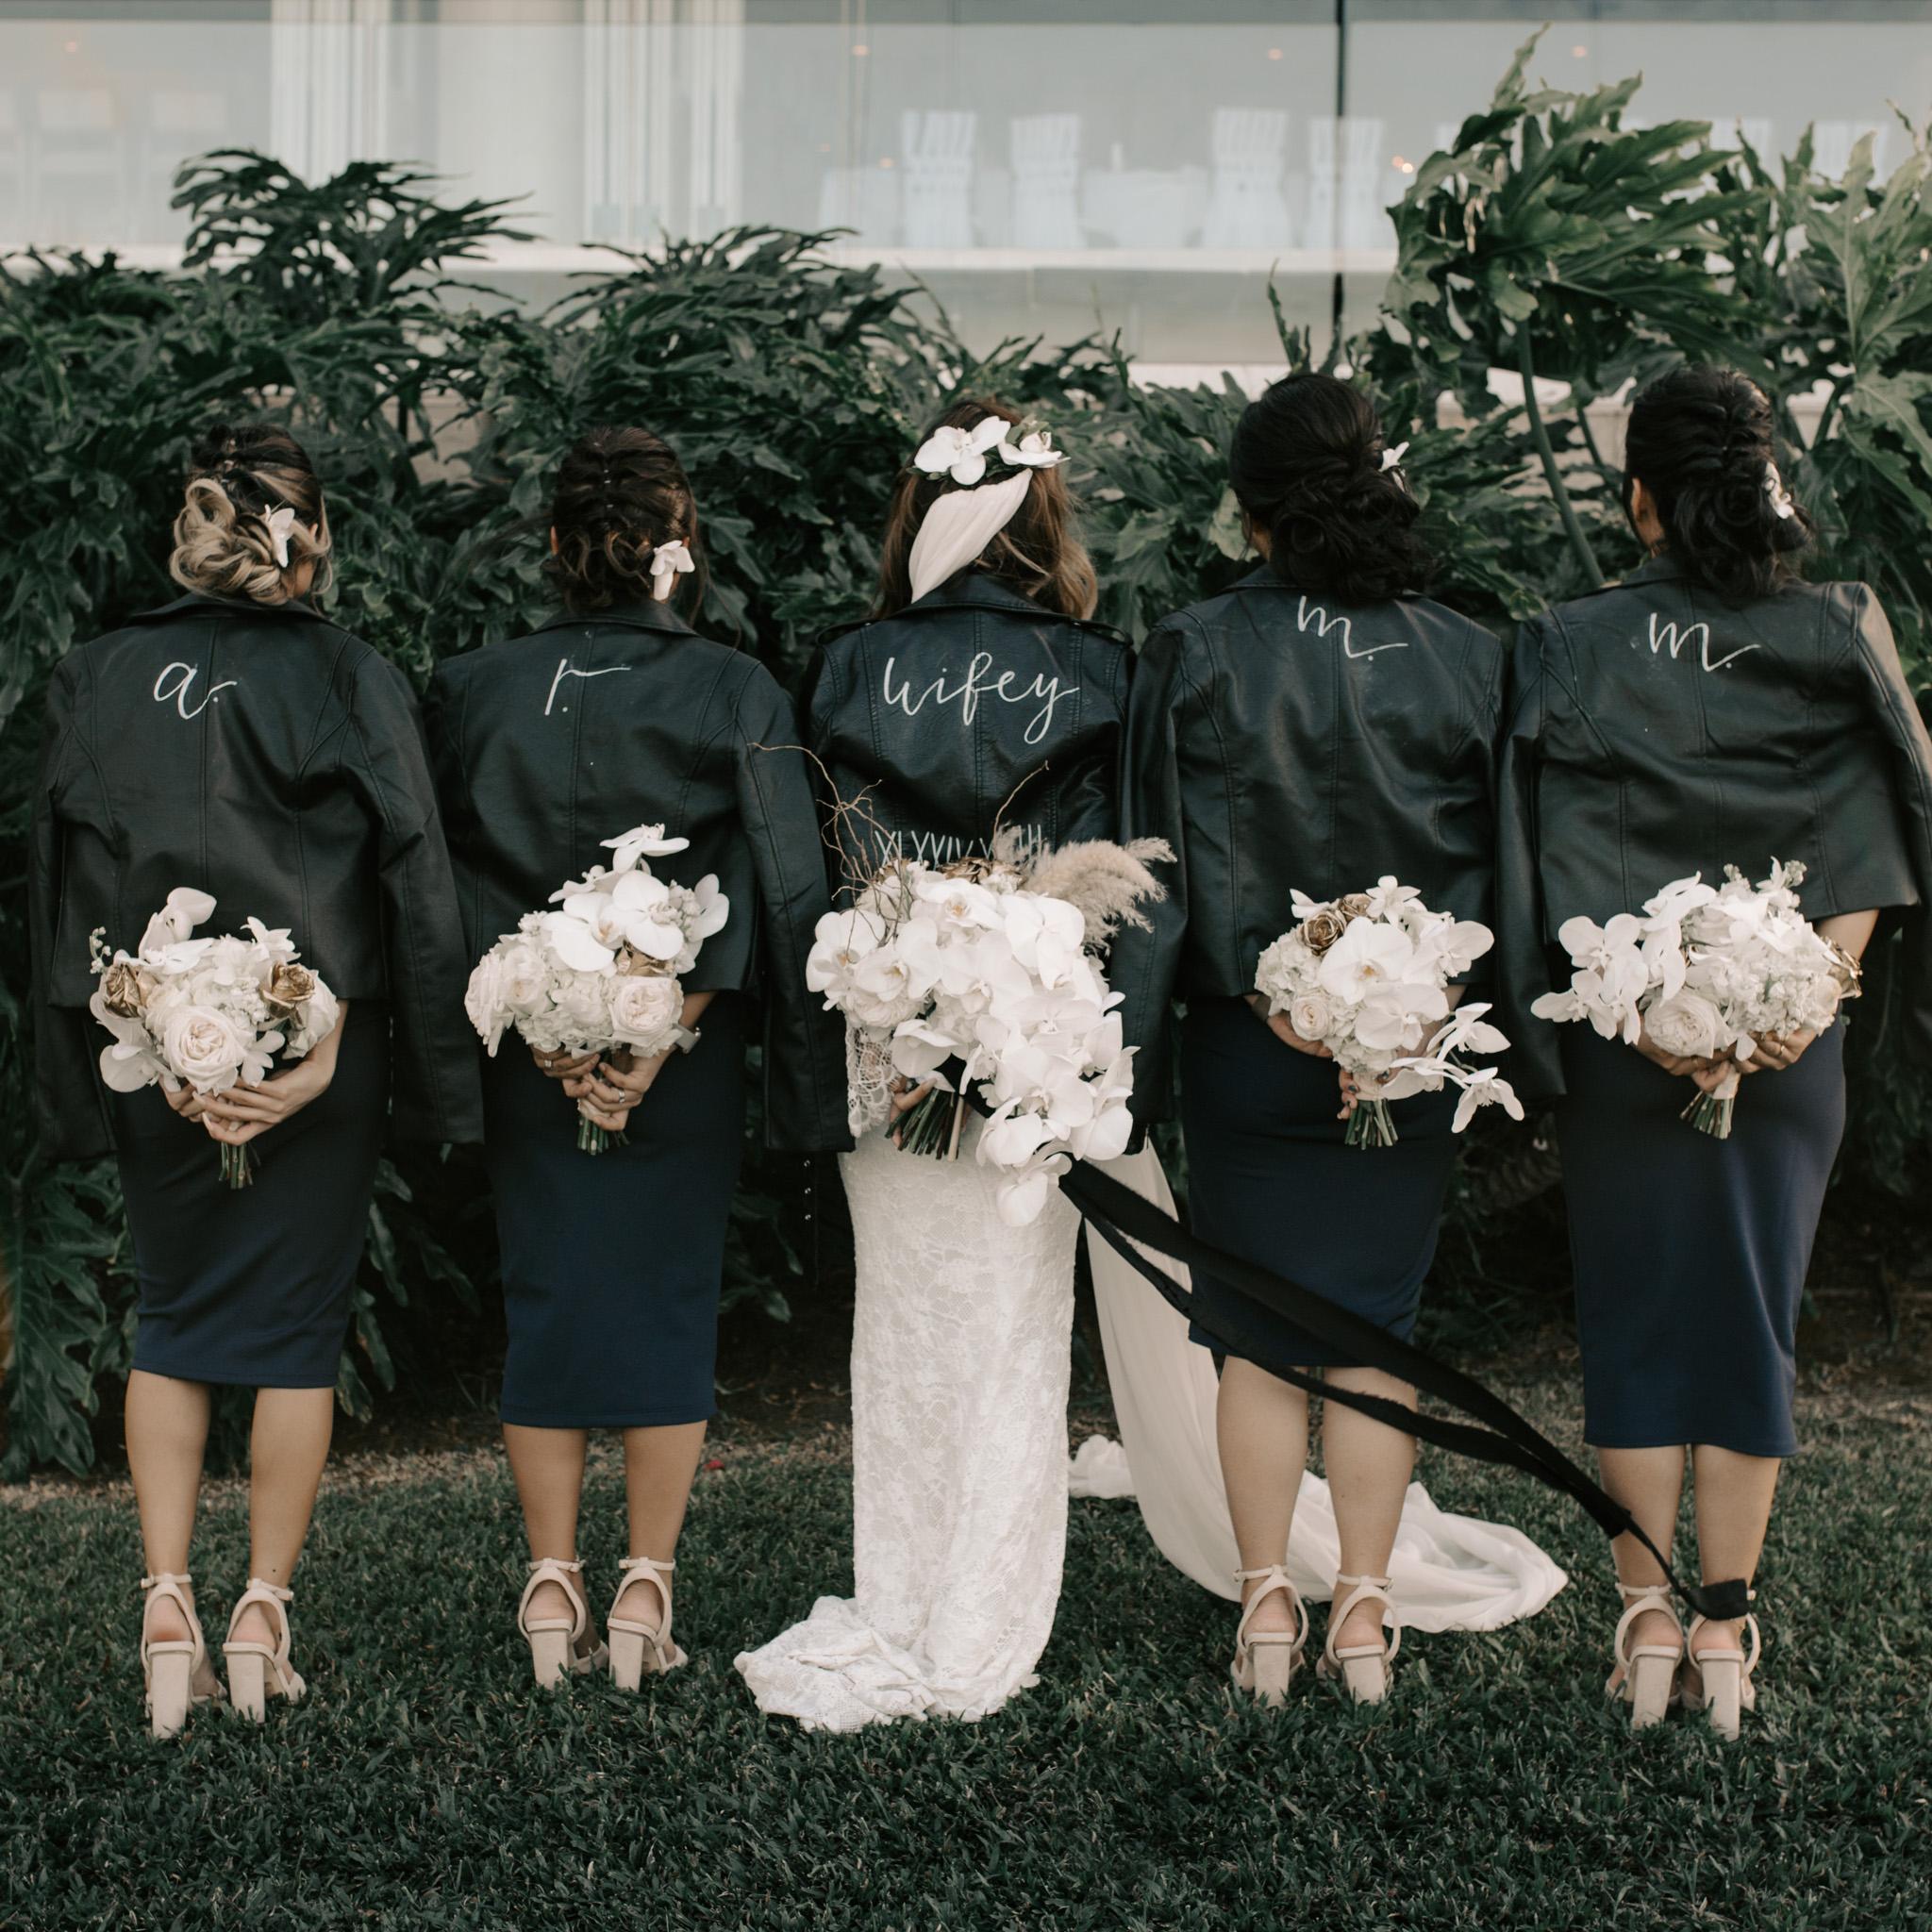 Bride and bridesmaids leather jackets   Merriman's Kapalua Maui wedding by Hawaii wedding photographer Desiree Leilani